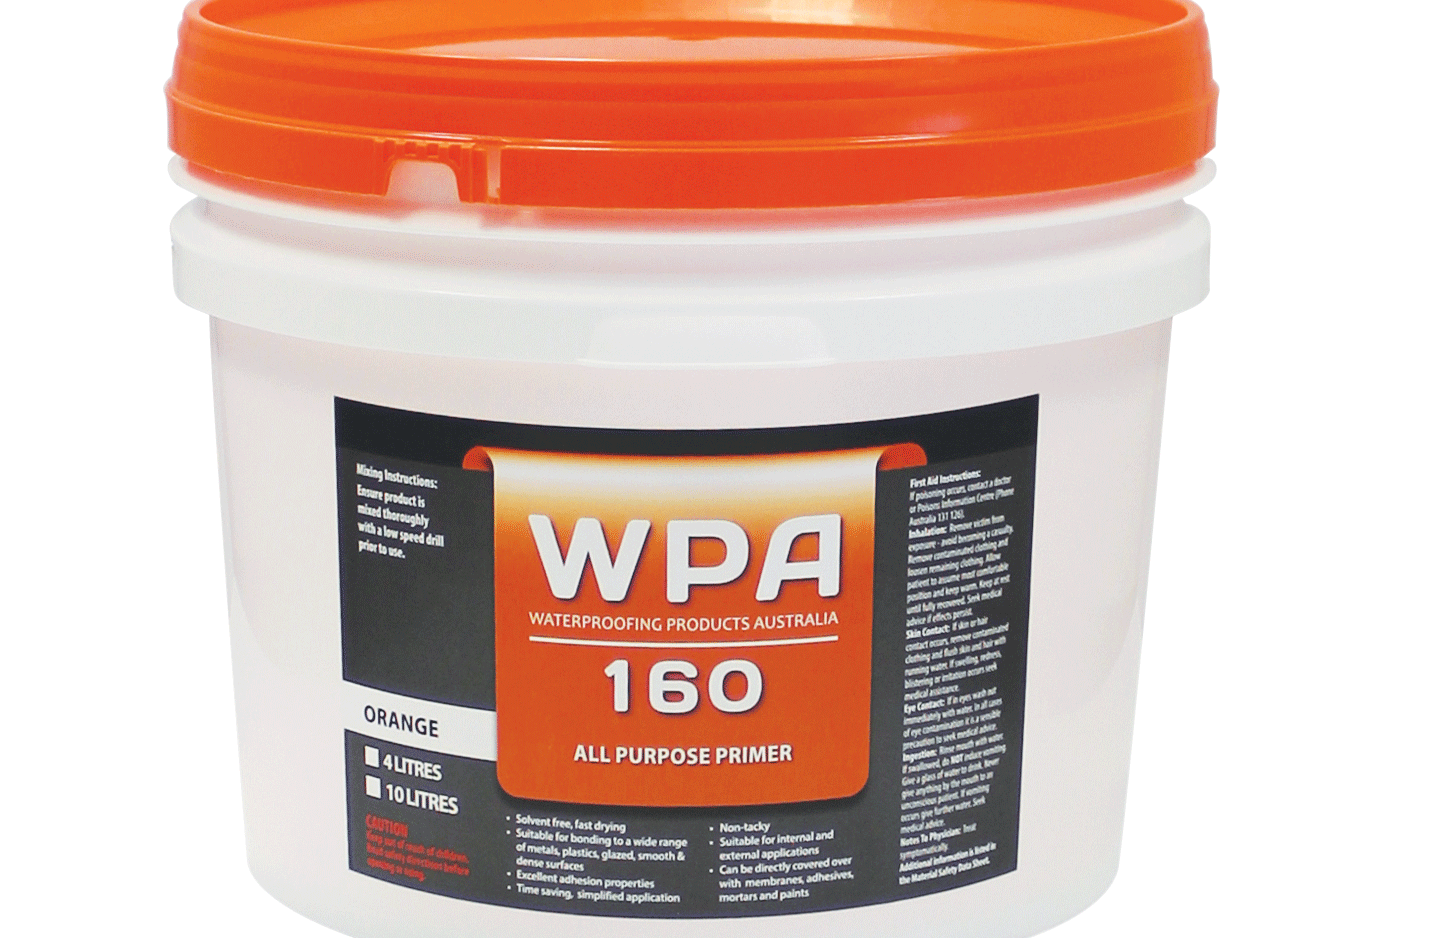 WPA-160-All-Purpose-Primer-4-Litre.png